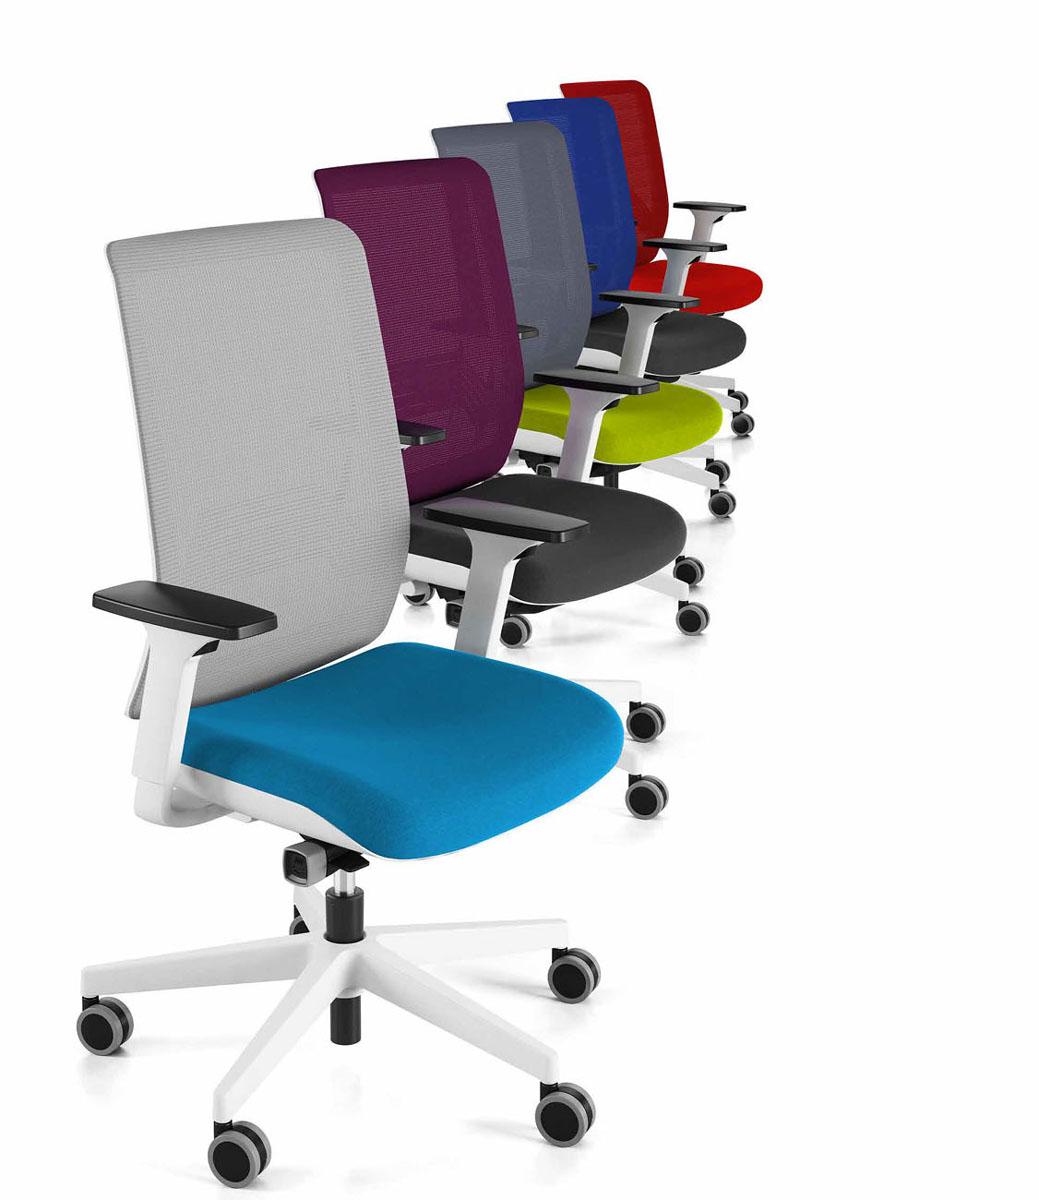 fabricant sokoa mobilier de bureau entr e principale. Black Bedroom Furniture Sets. Home Design Ideas